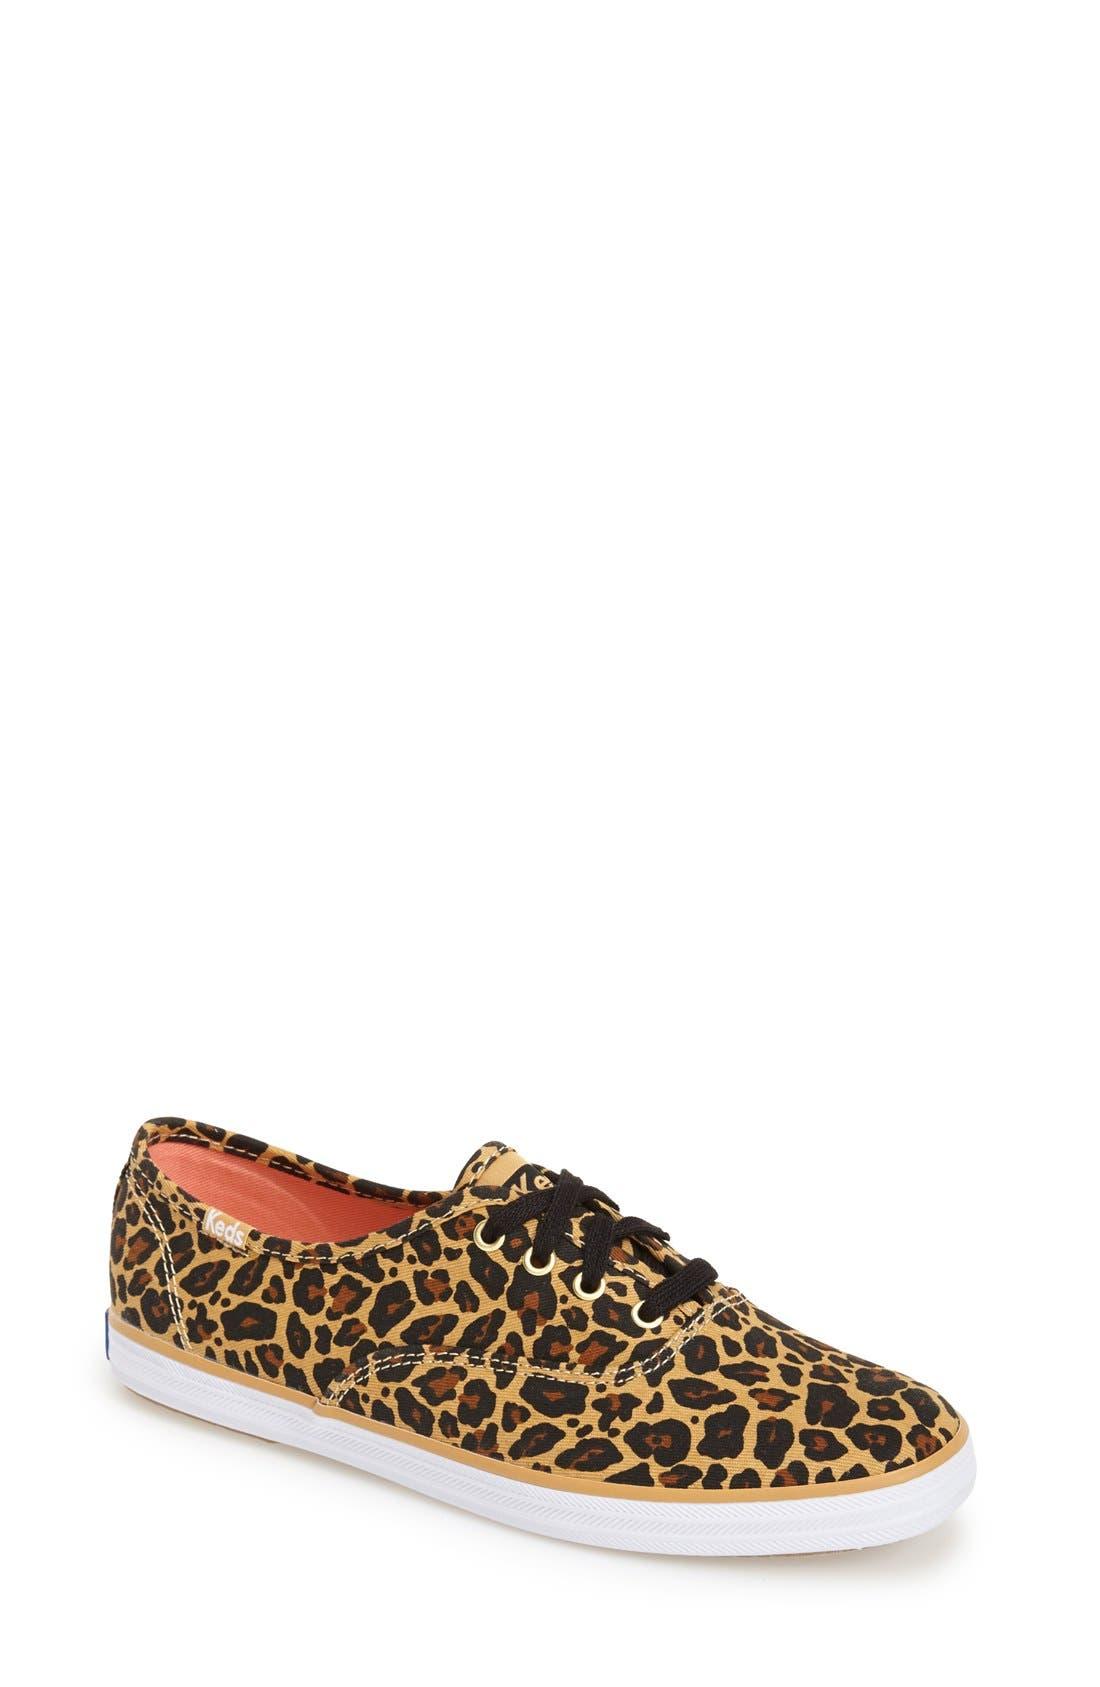 KEDS<SUP>®</SUP> 'Champion' Leopard Print Sneaker, Main, color, 230